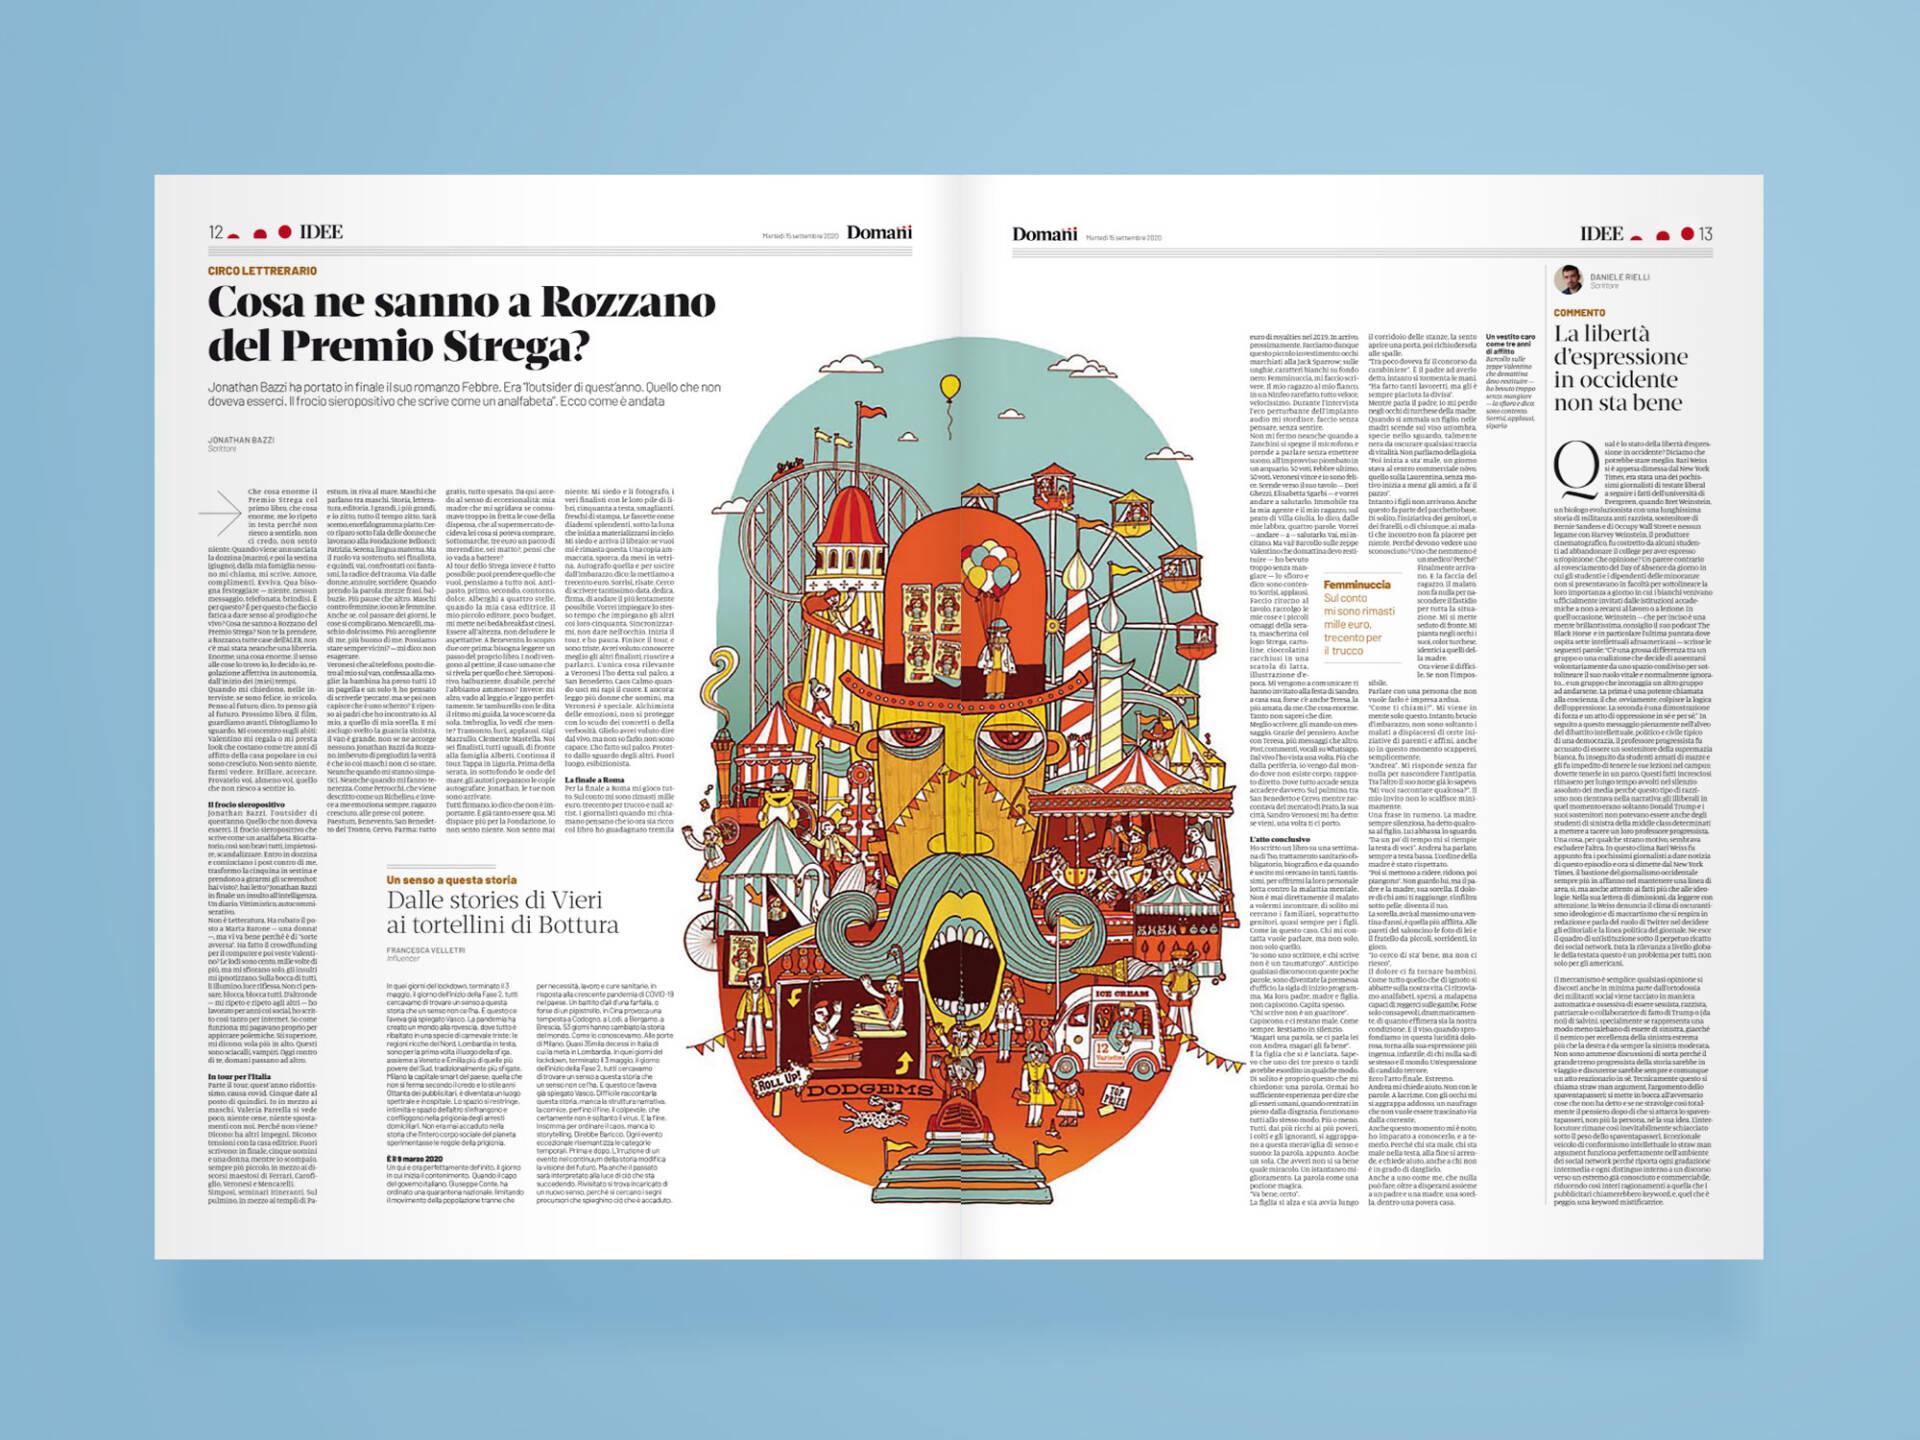 Domani_Print_07_Wenceslau_News_Design